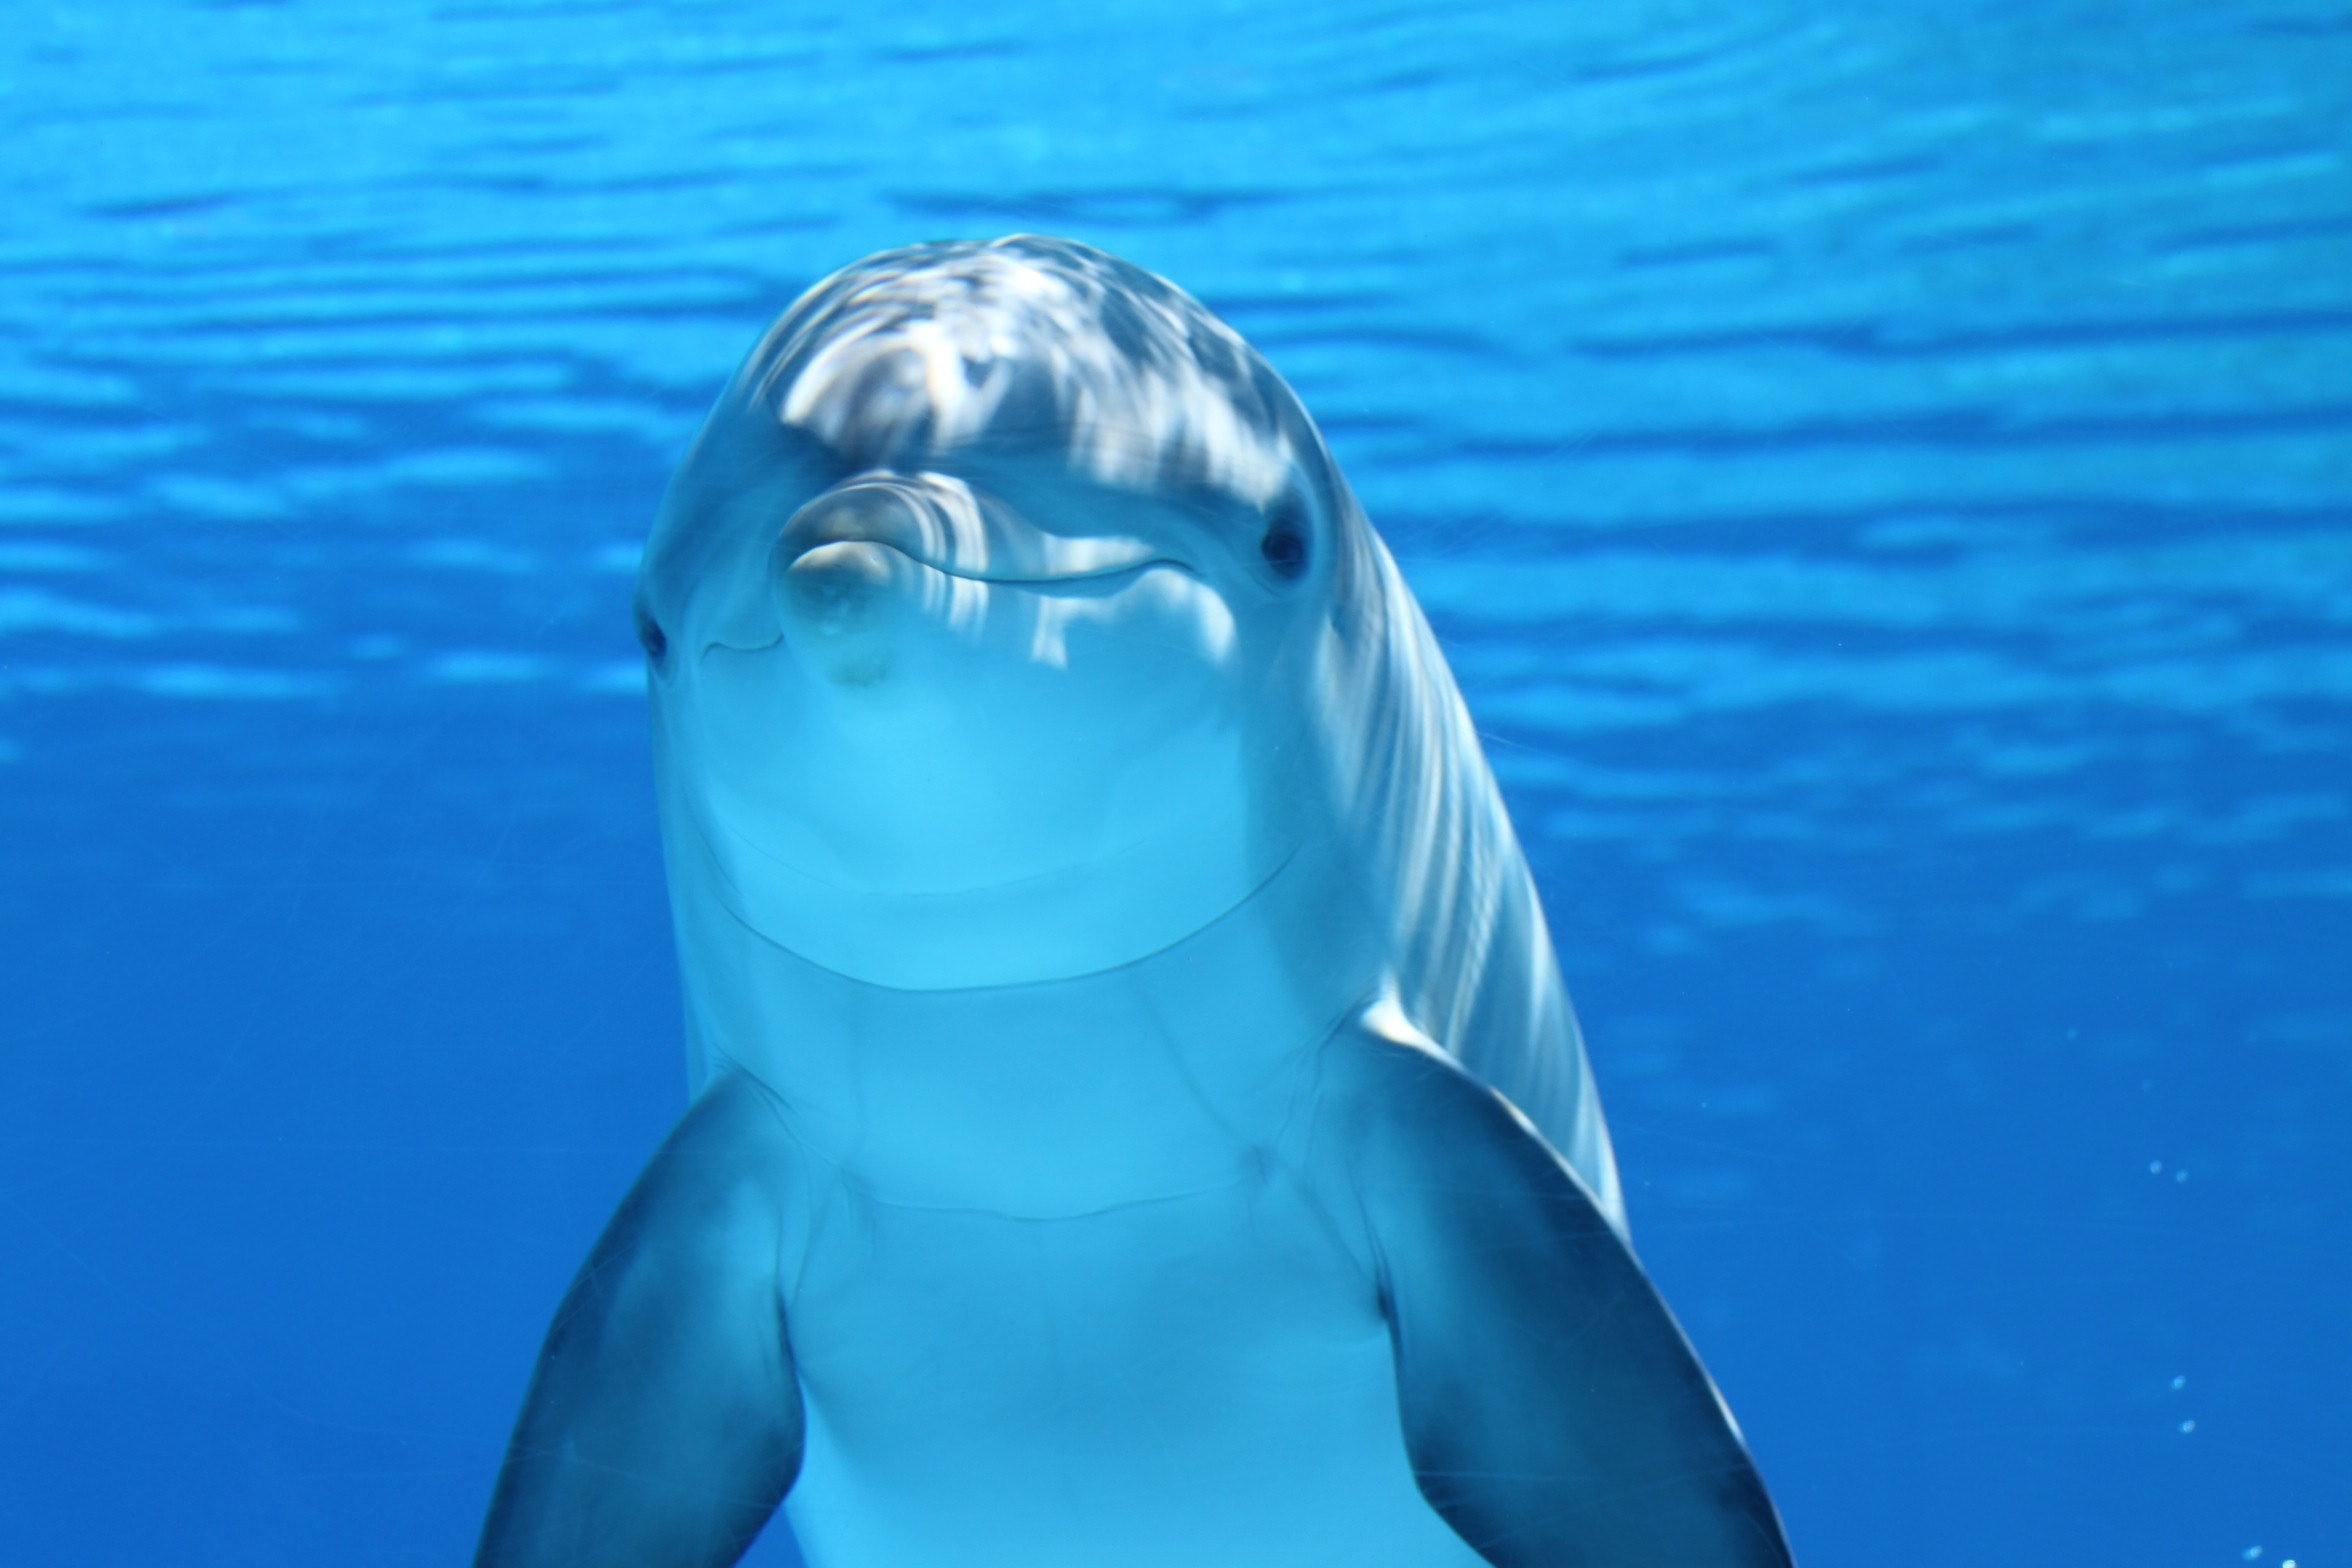 animal-bottlenose-dolphin-close-up-64219.jpg